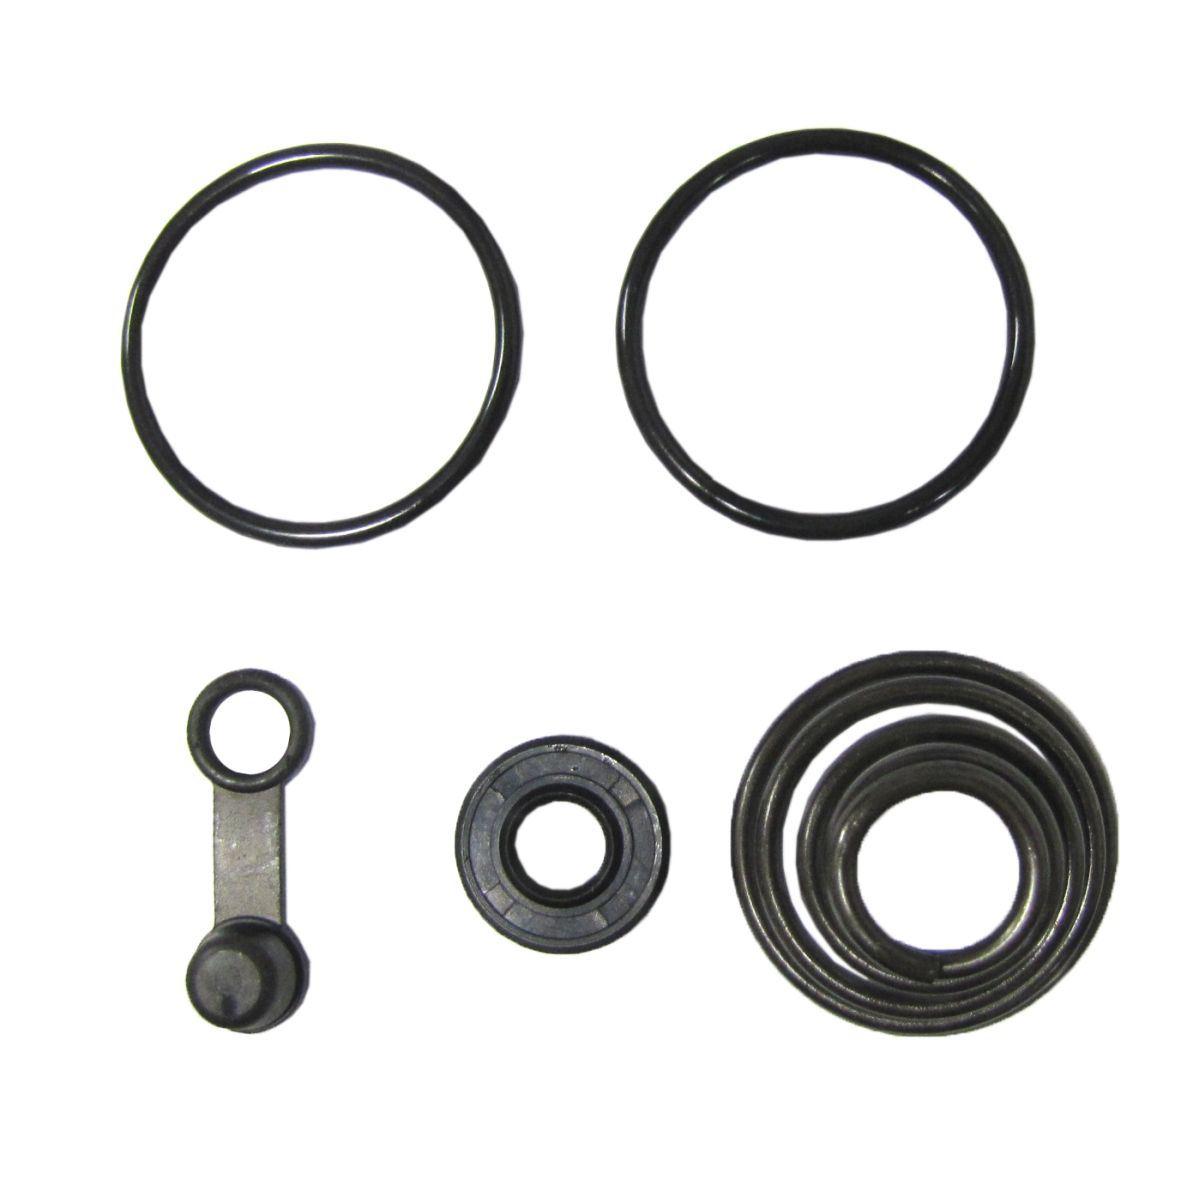 Aw Motorcycle Parts Clutch Slave Kit Honda Cbf 06 10